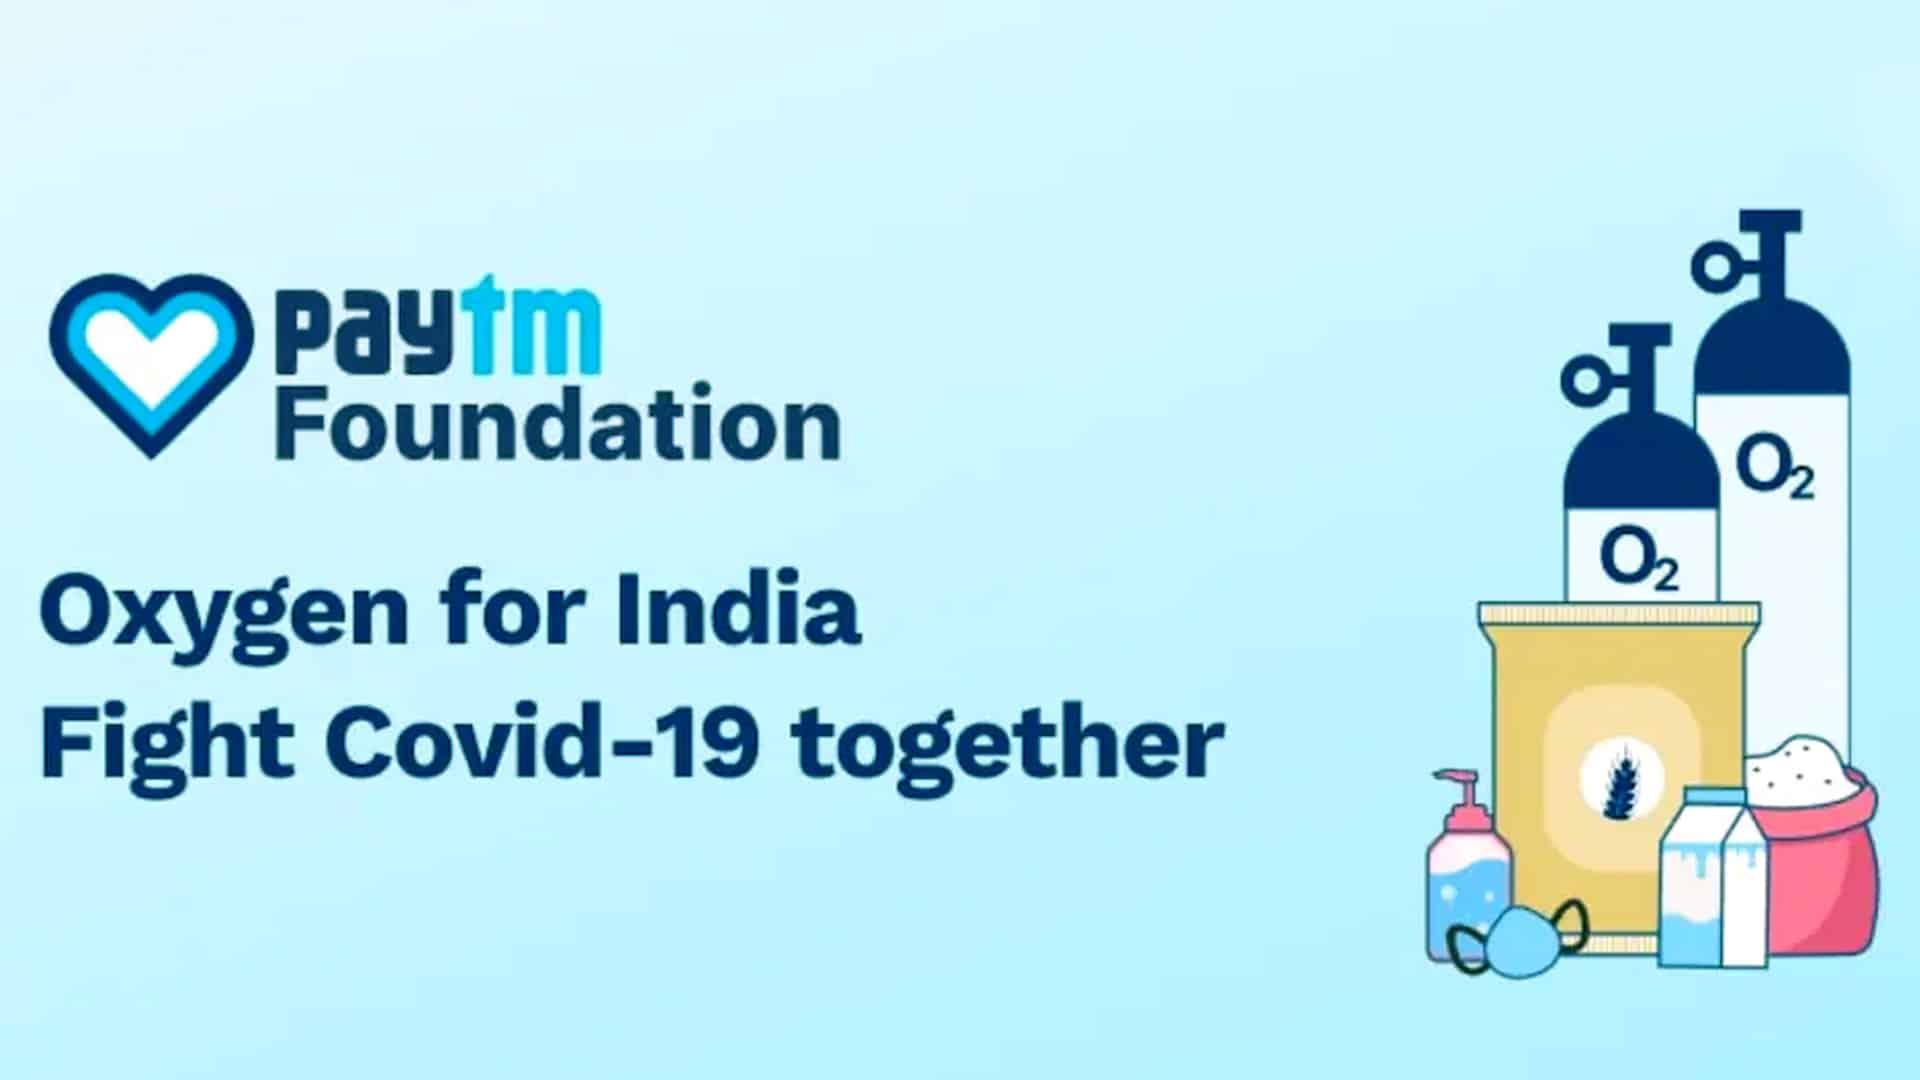 Paytm-Foundation-donates-oxygen-generation-plant-100-concentrators-to-Gujarat